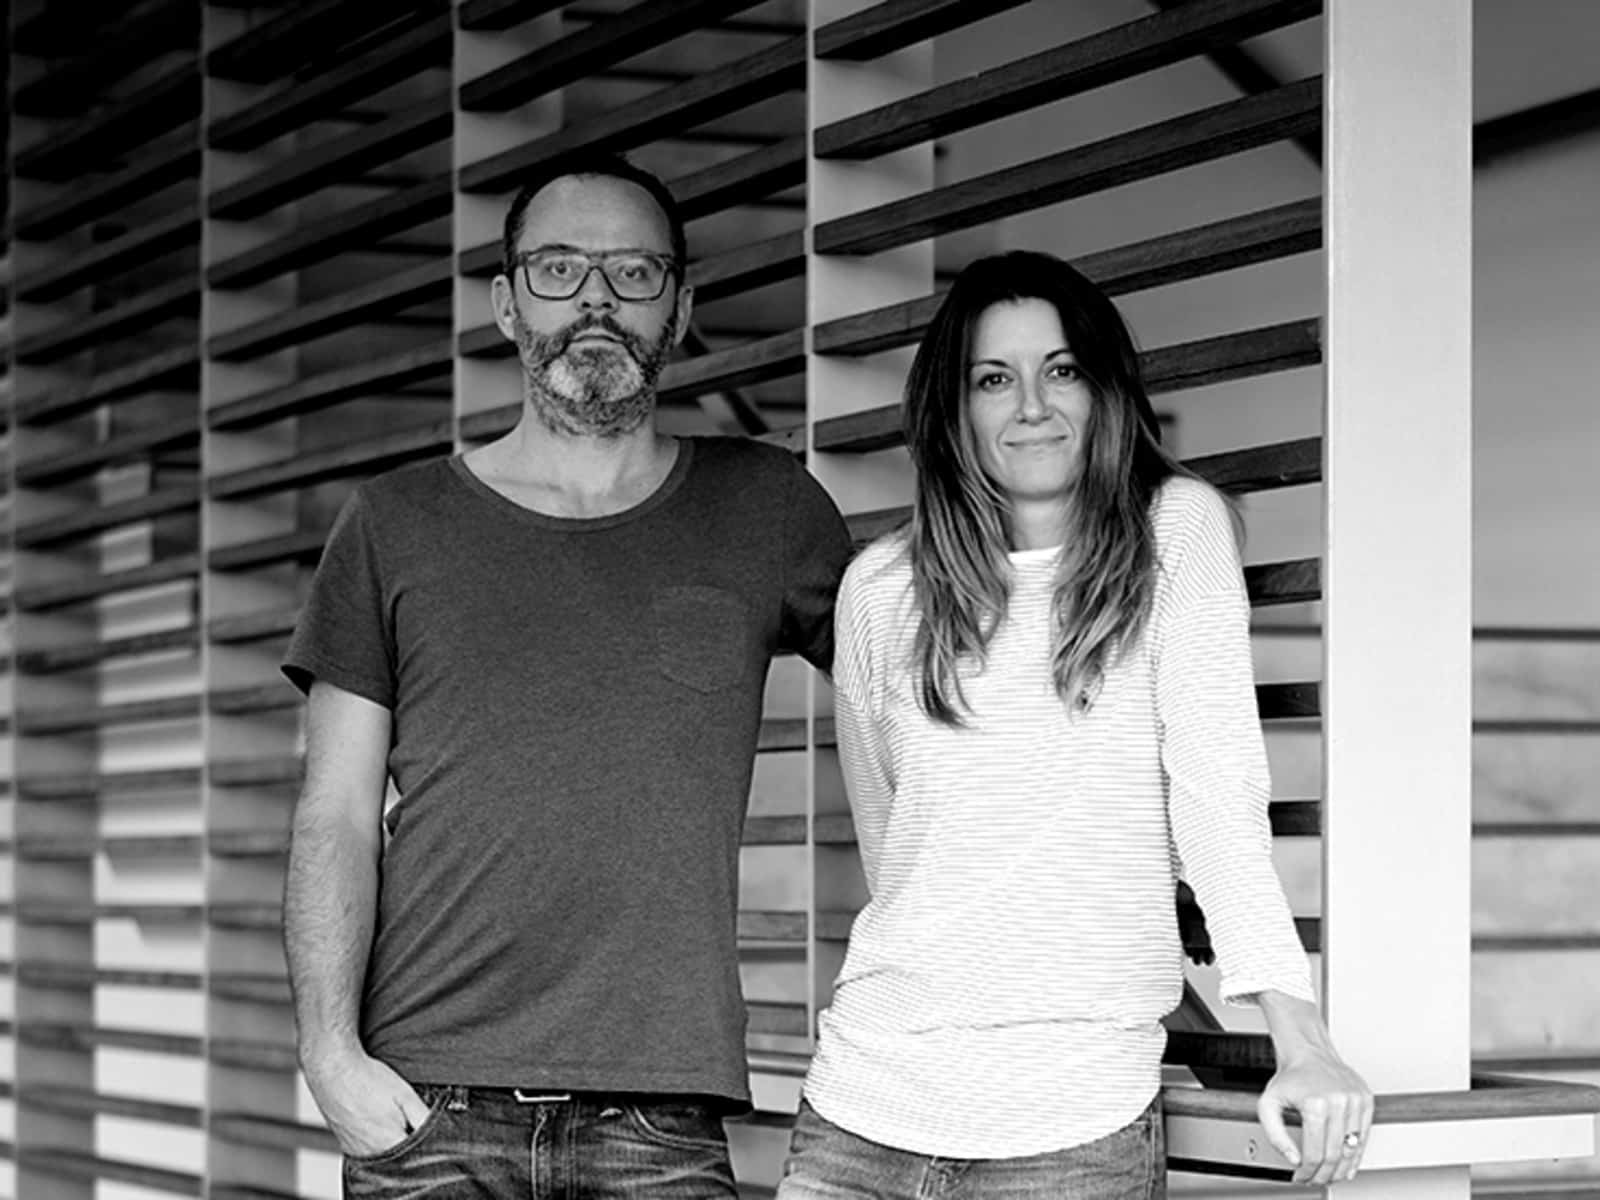 Katy & Jason from Sydney, New South Wales, Australia